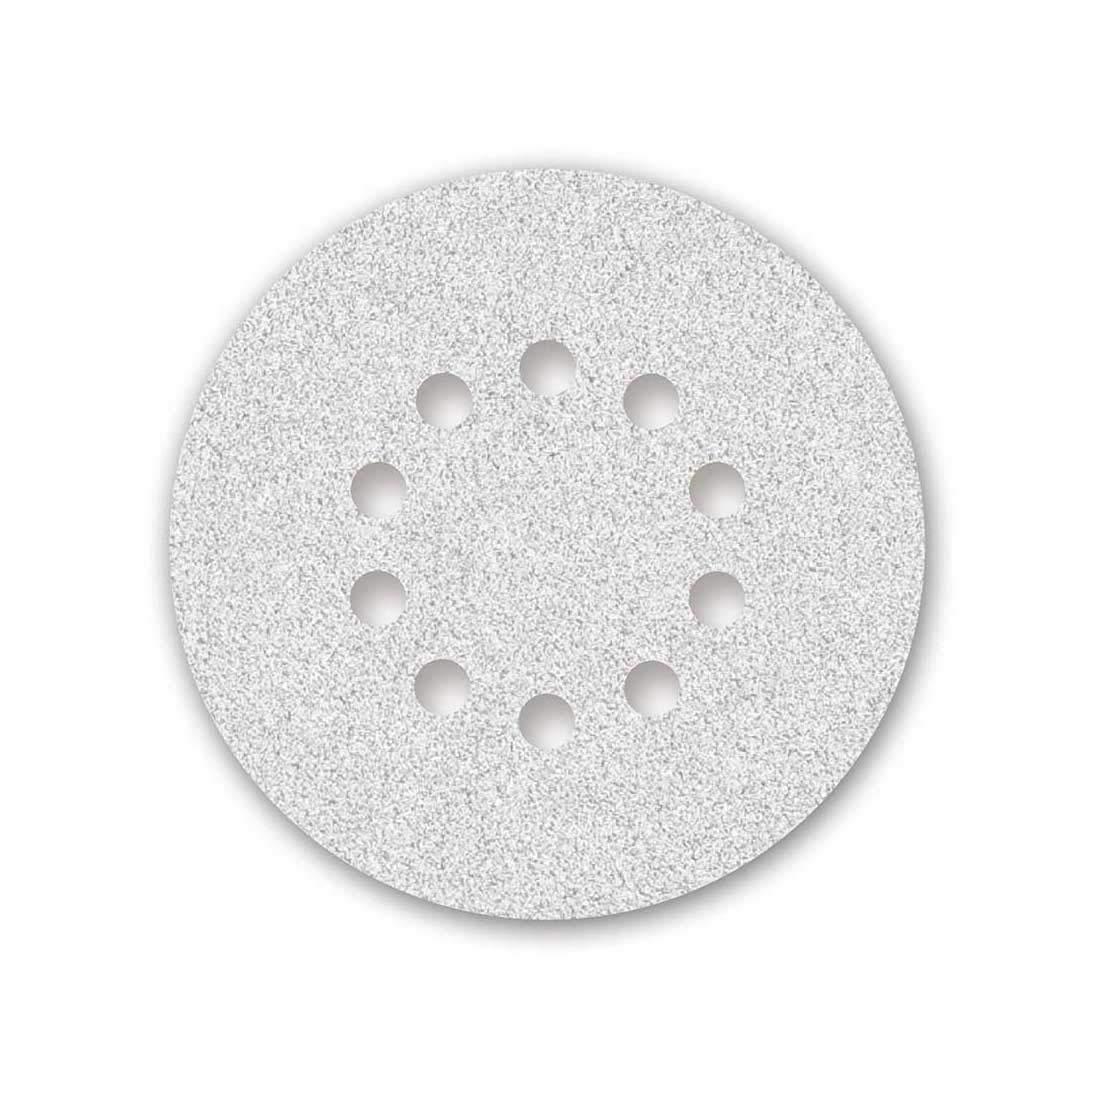 /ø 225 mm 10-hole Grit 240 25 MENZER Hook /& Loop Sanding Discs for Dry Wall//Ceiling Sander white